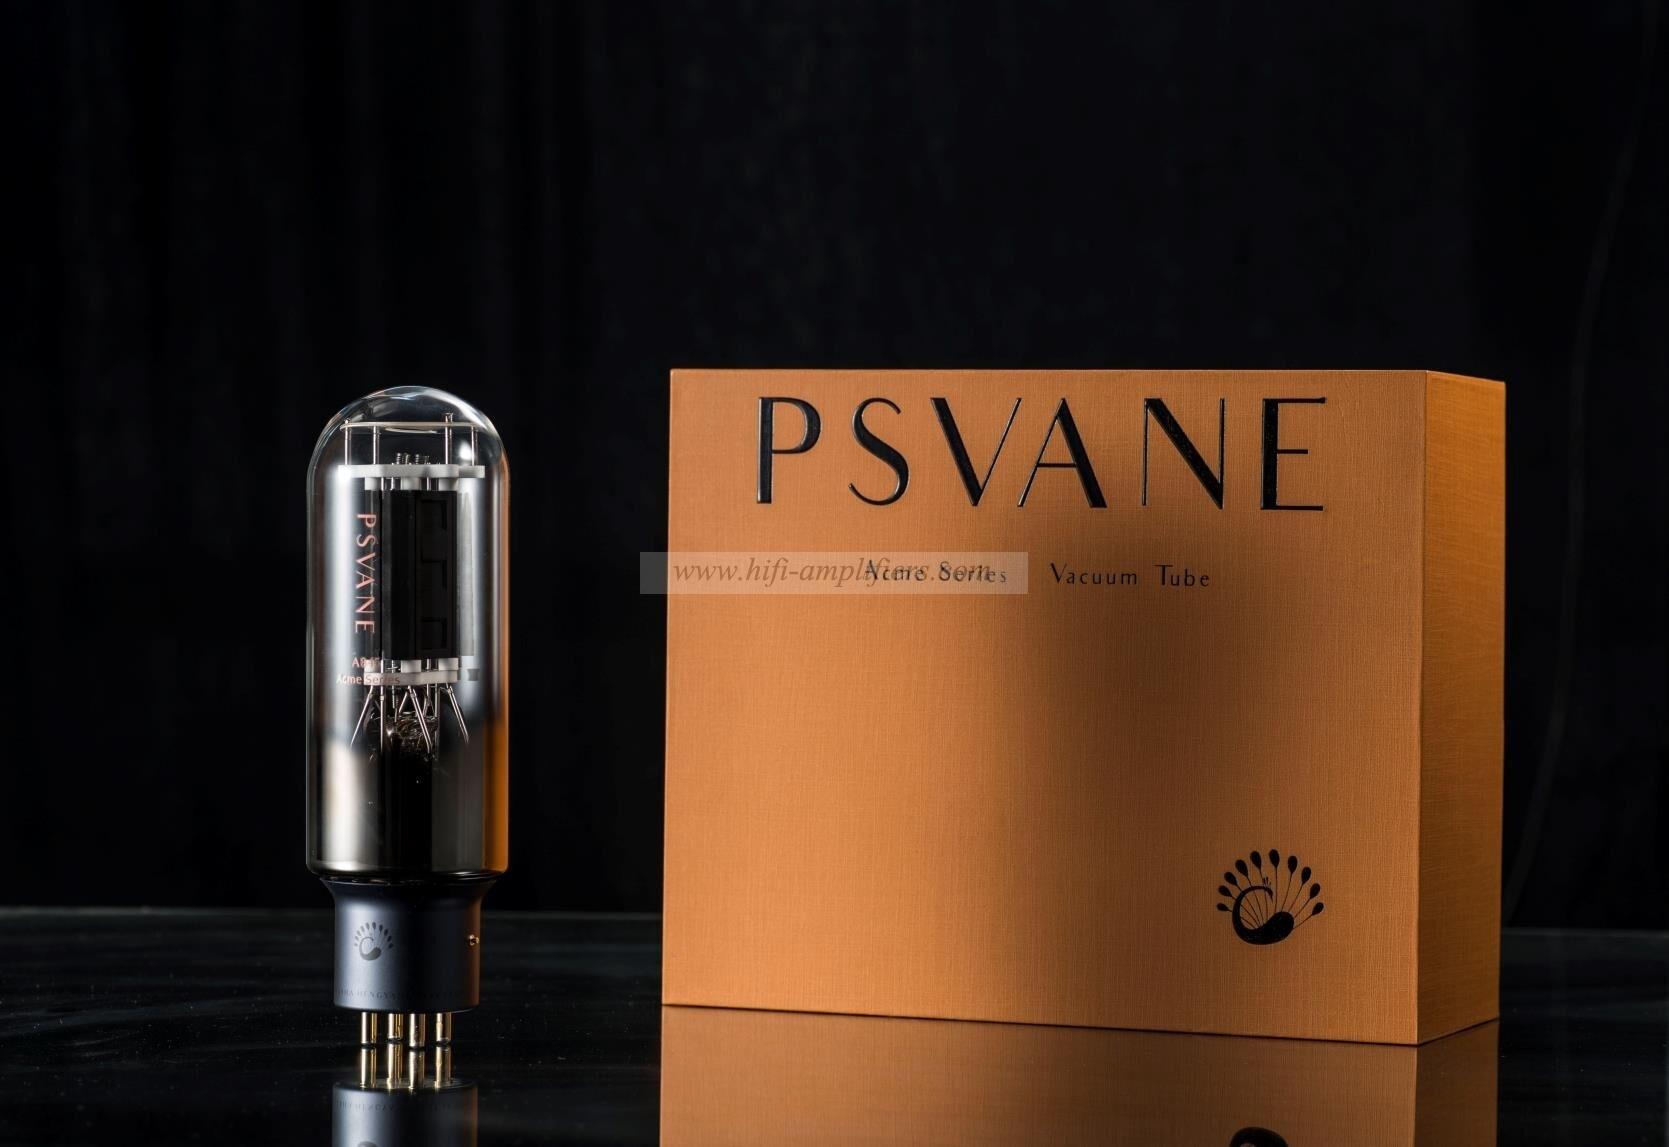 PSVANE Acme Serie 845 Vacuum Tube HiFi electronic Valve Matched Pair